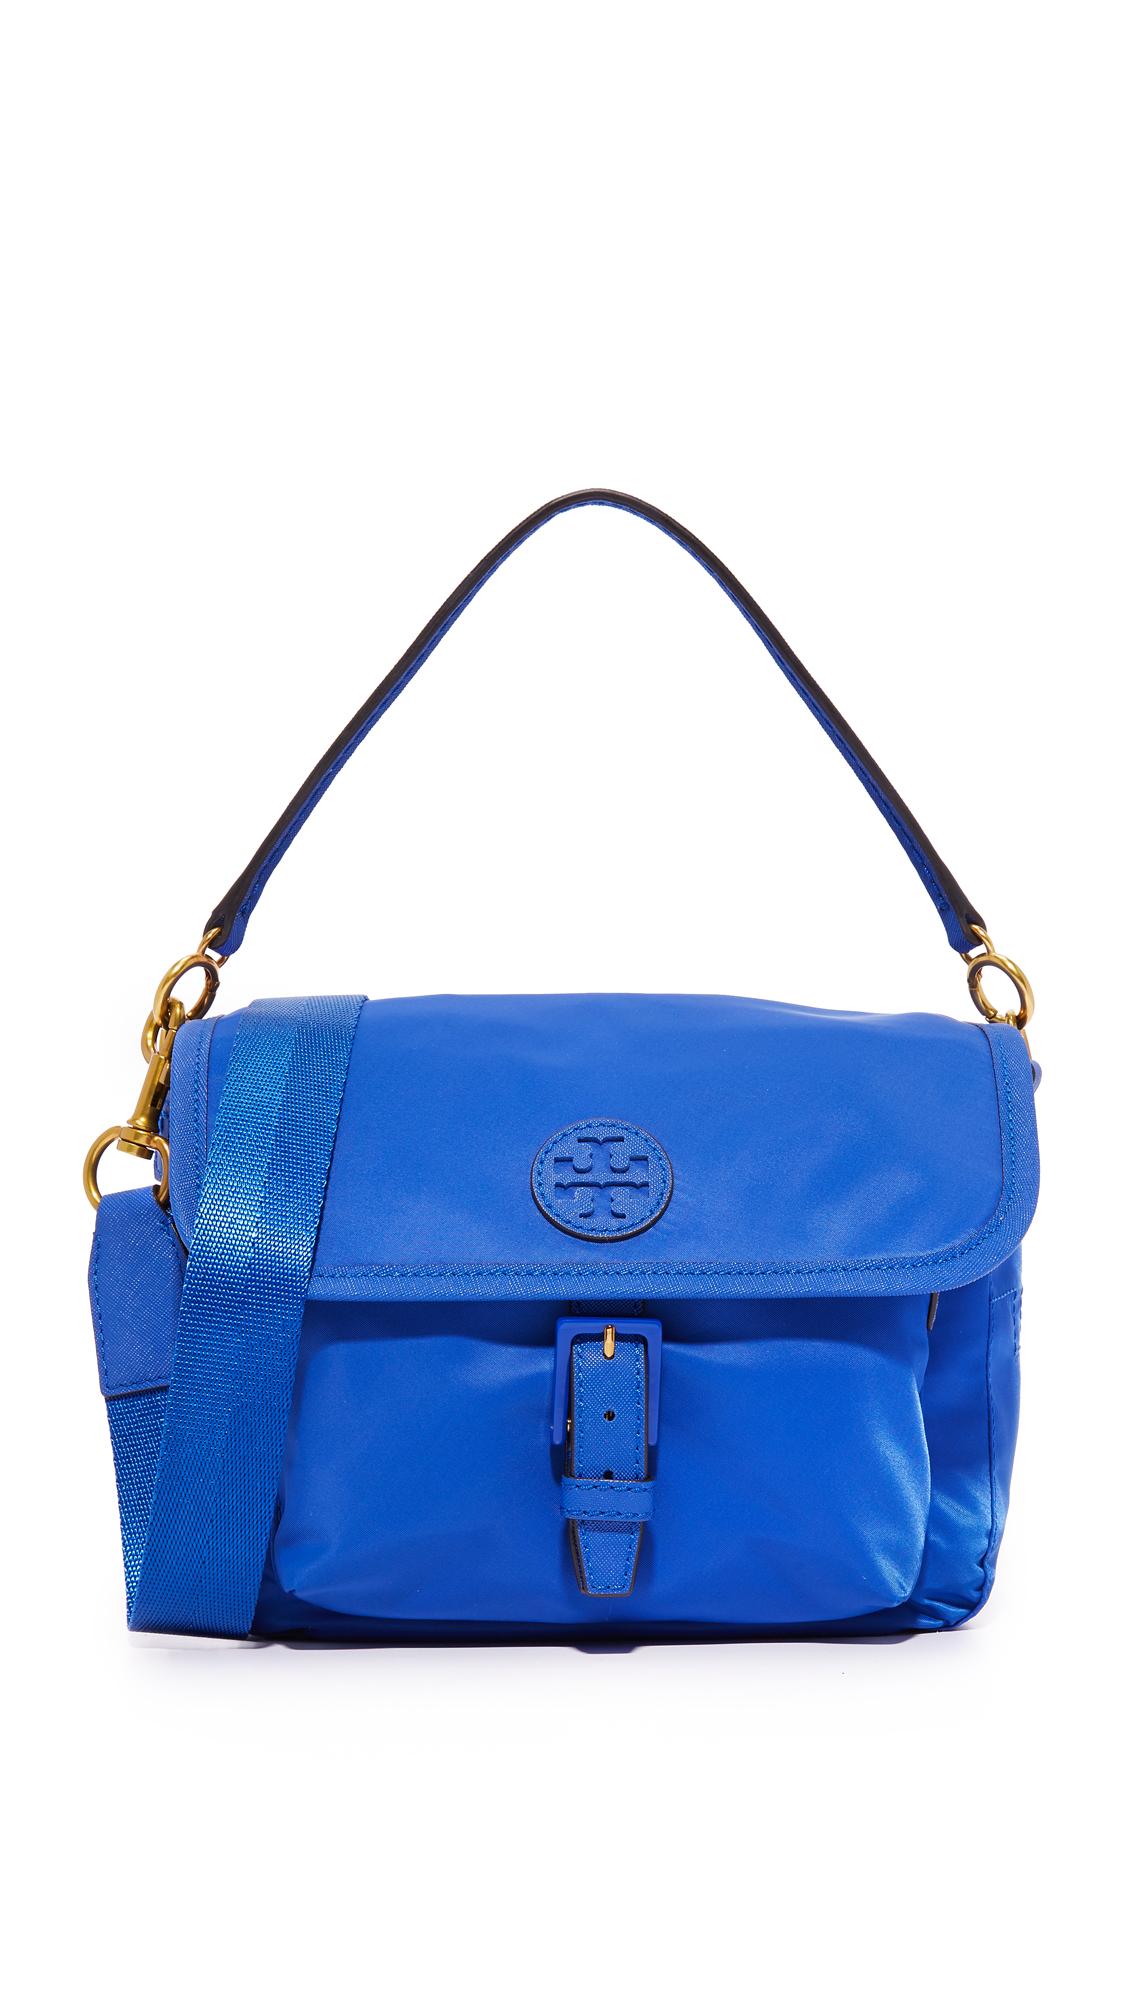 8d60ba0c1f16e Tory Burch Scout Nylon Cross Body Bag